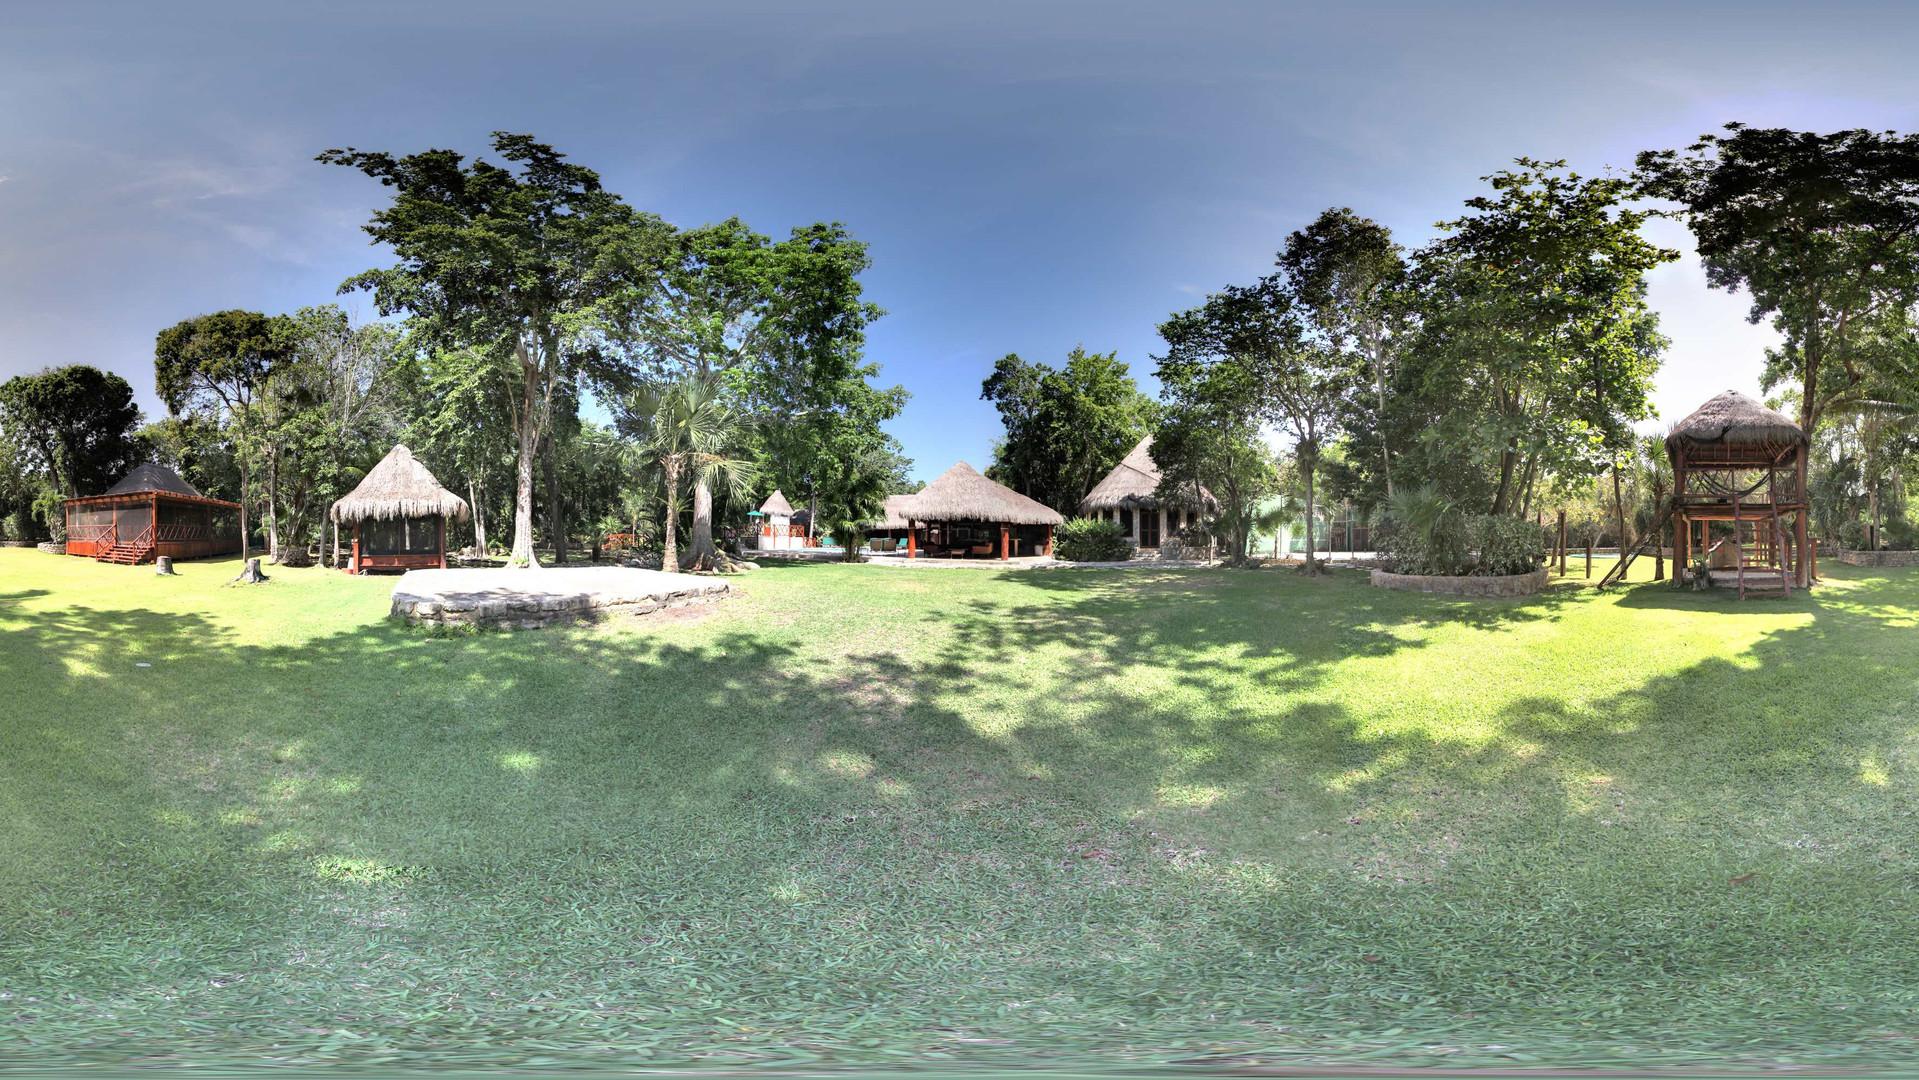 IMG_3074 Panorama.jpg